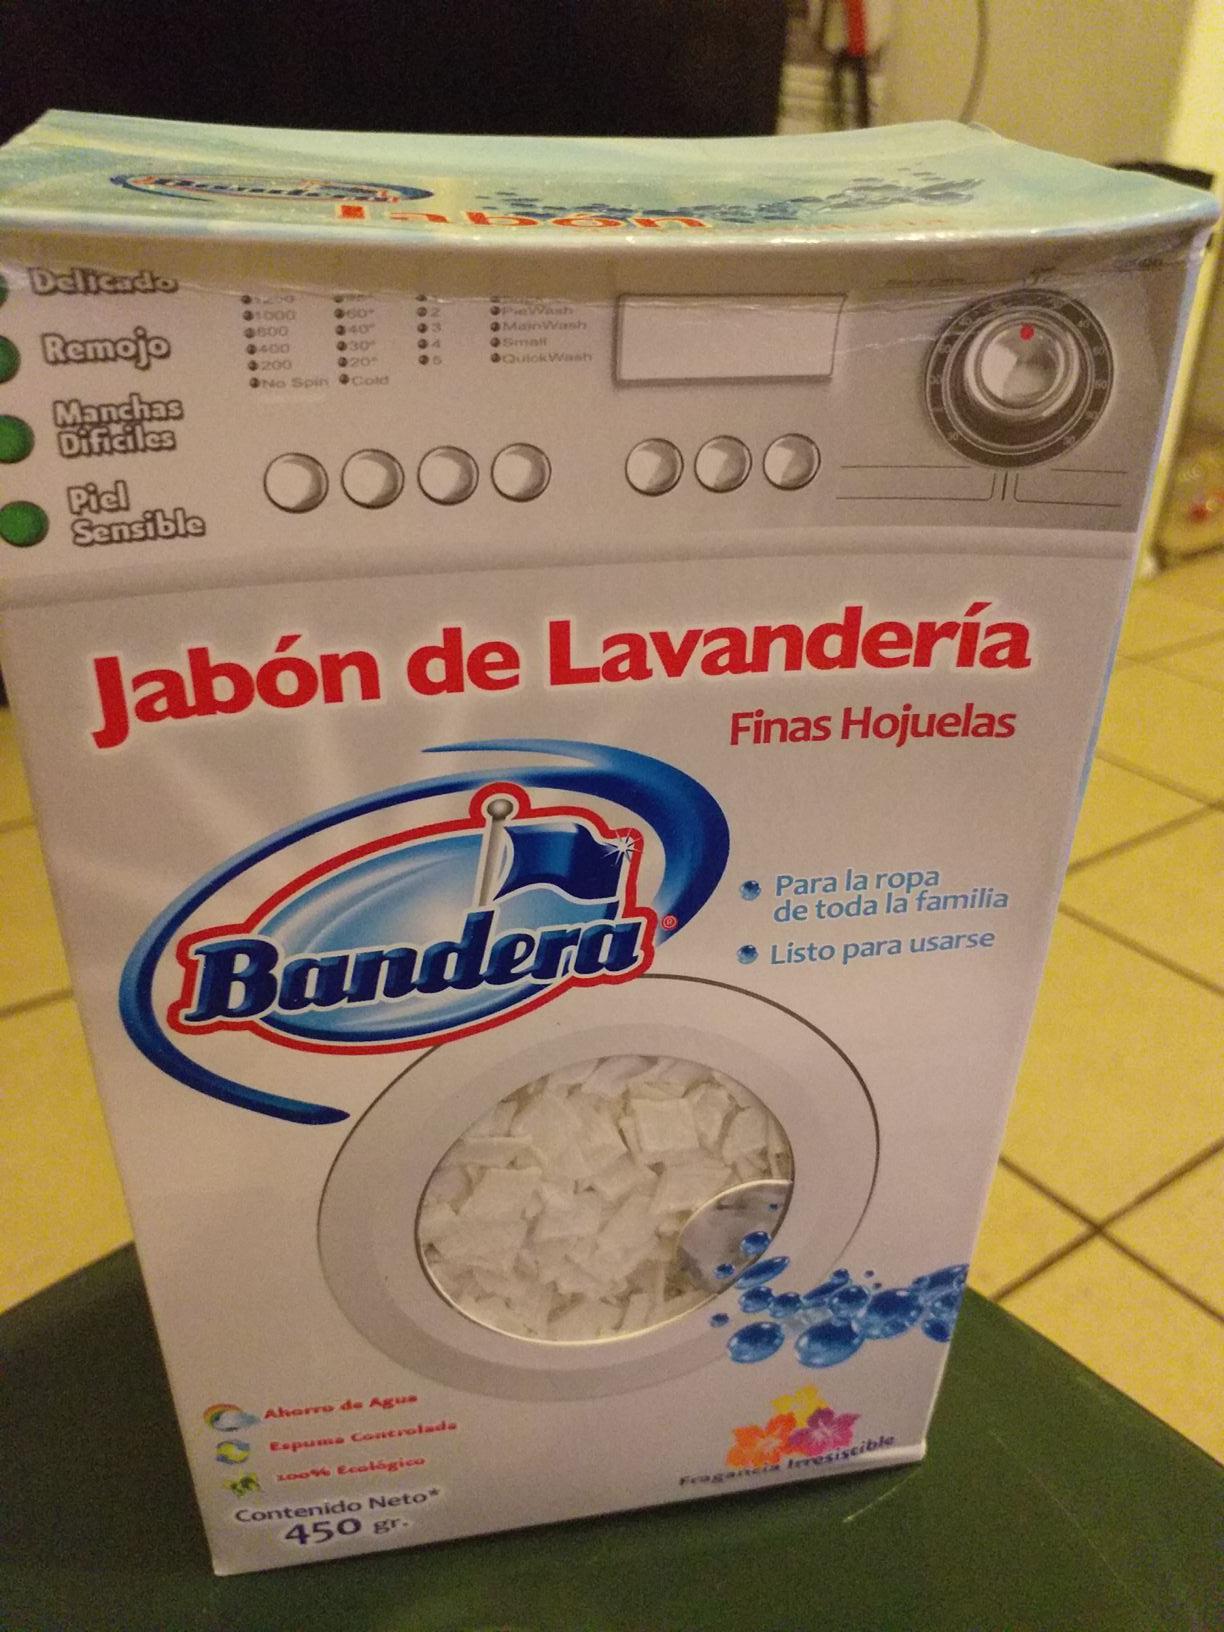 Bodega Aurrerá Plaza Churubusco caja de Jabón de lavandería a $10.03